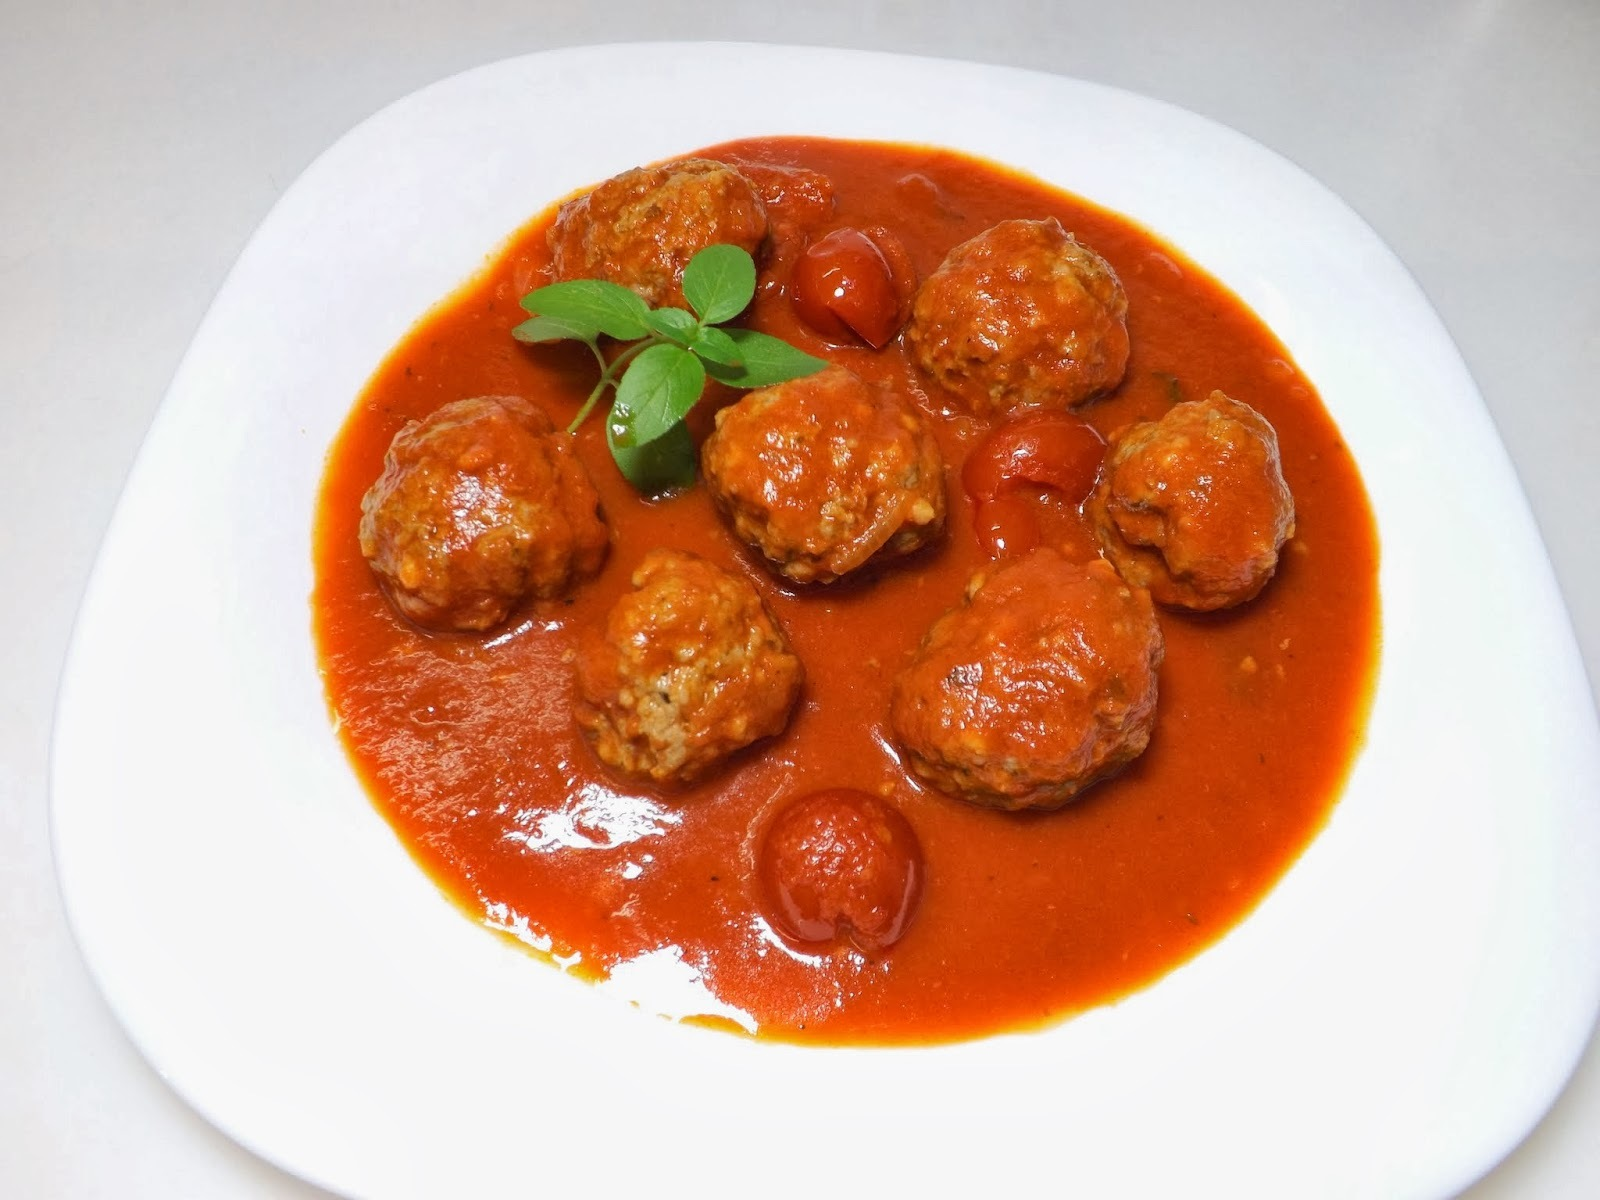 almondegas de carne moida com molho de tomate